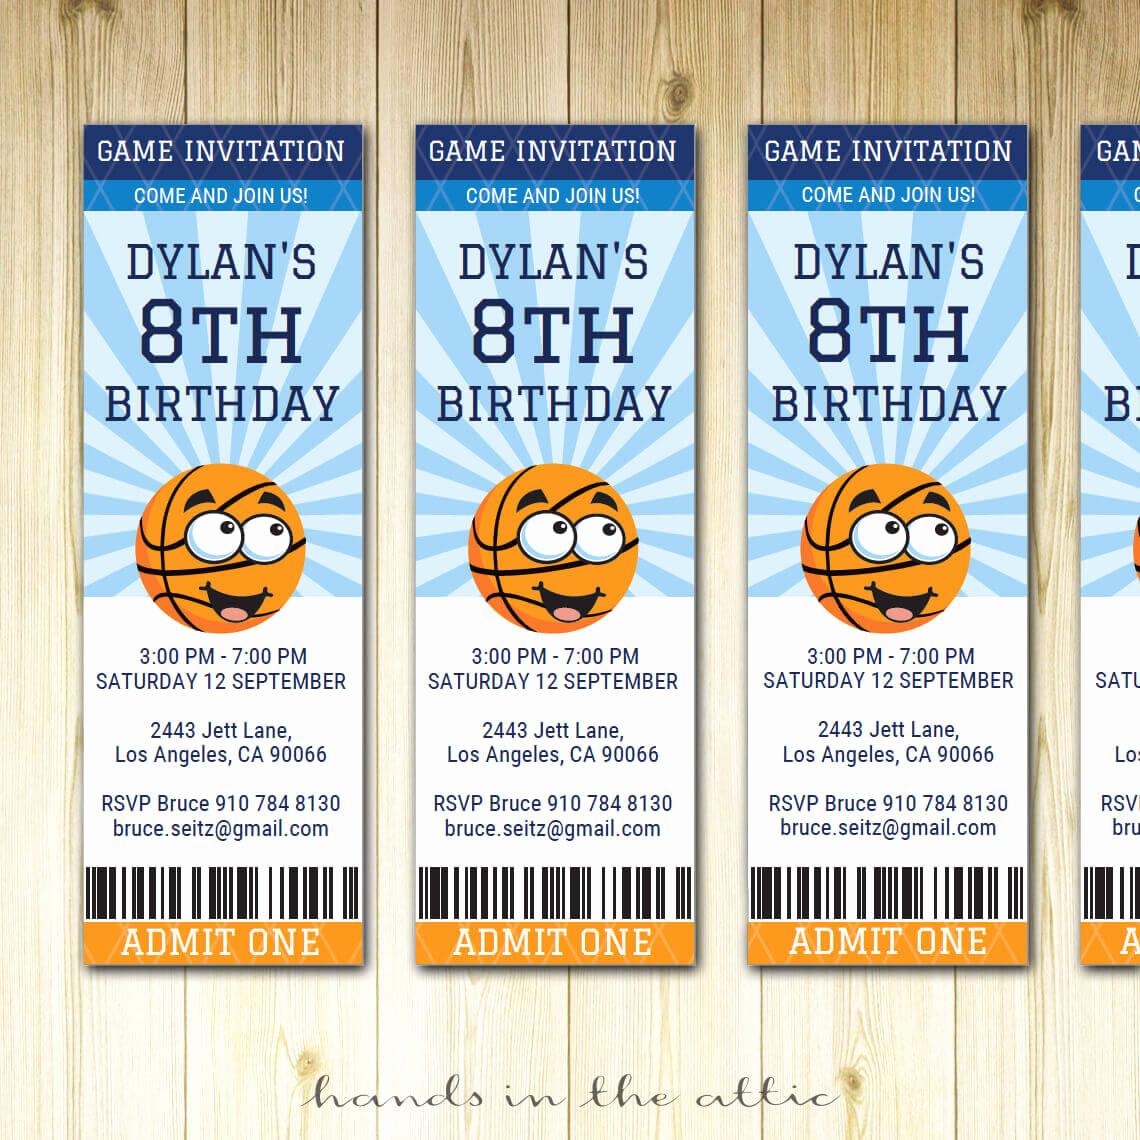 Basketball Ticket Invitation Template Beautiful Basketball Ticket Invitation Printable Template